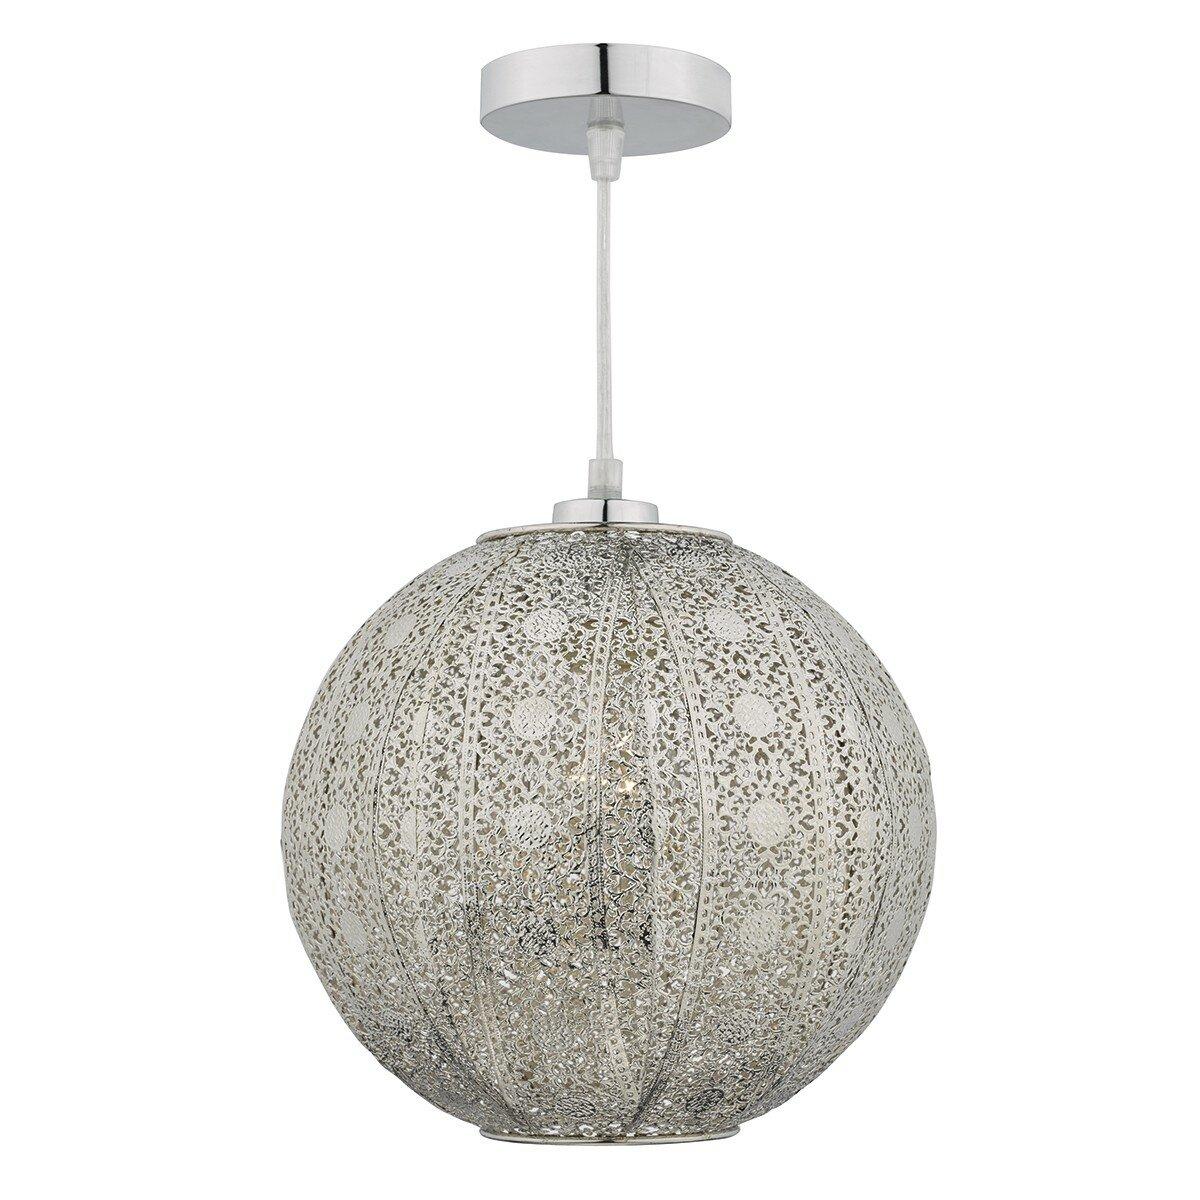 Dar Lighting Bazar 1 Light Globe Pendant